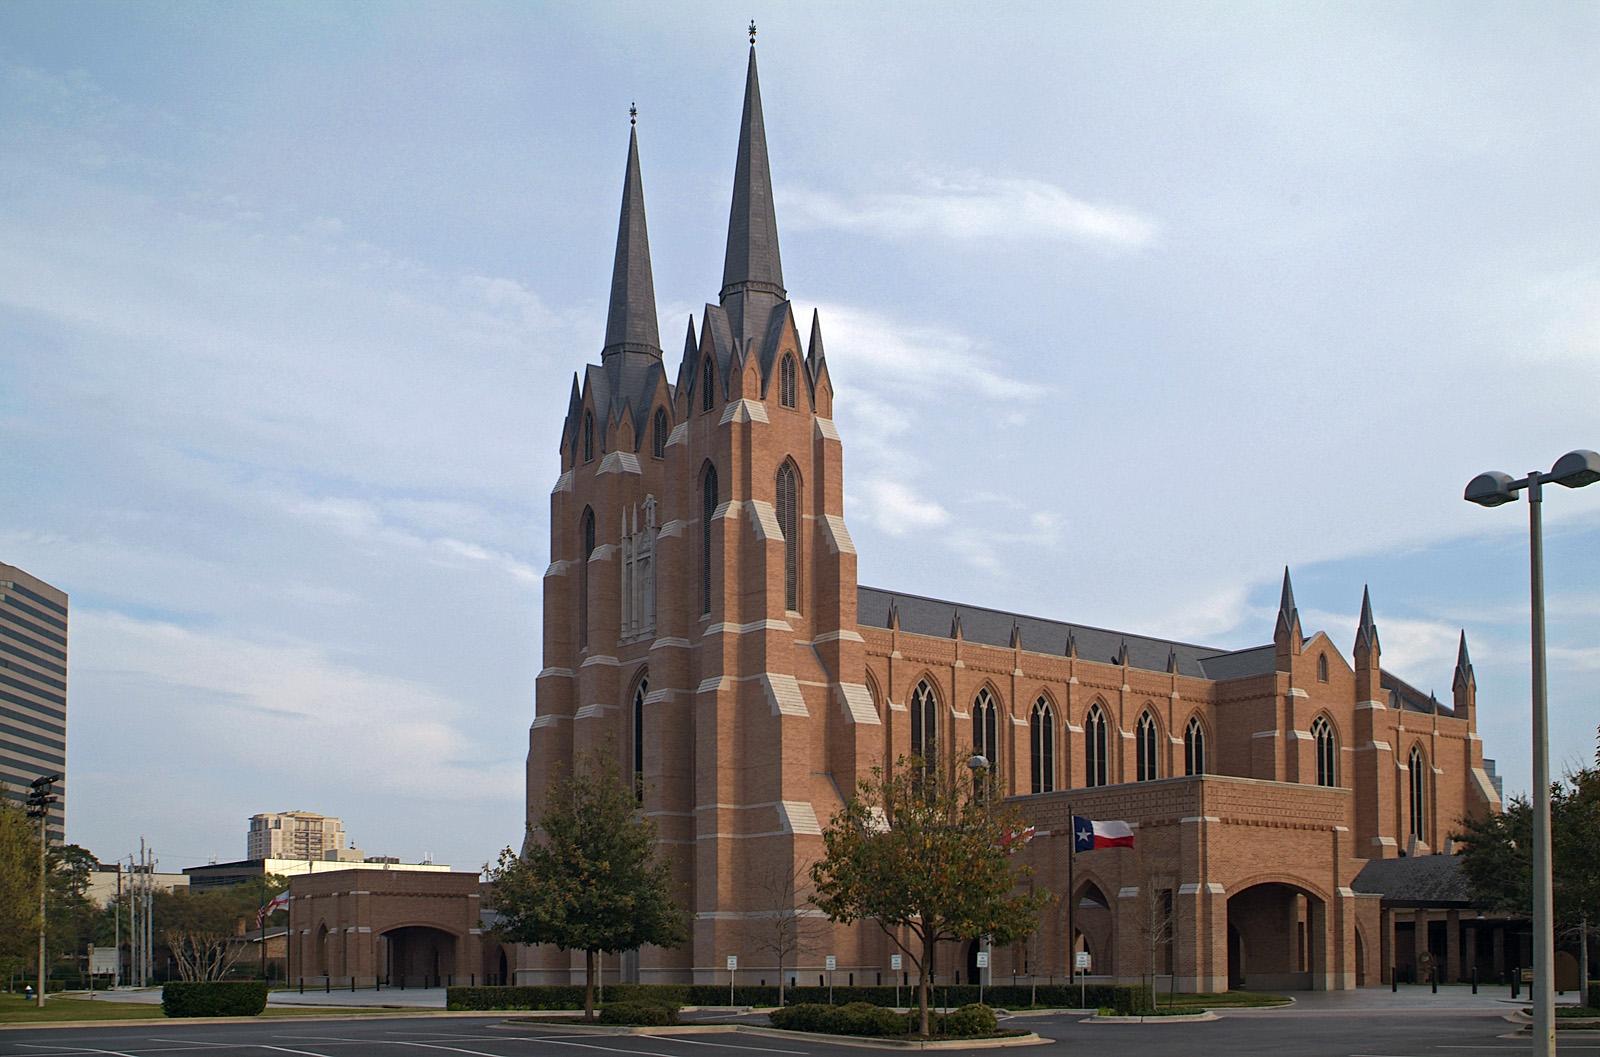 Saint Martins Church on Woodway 04